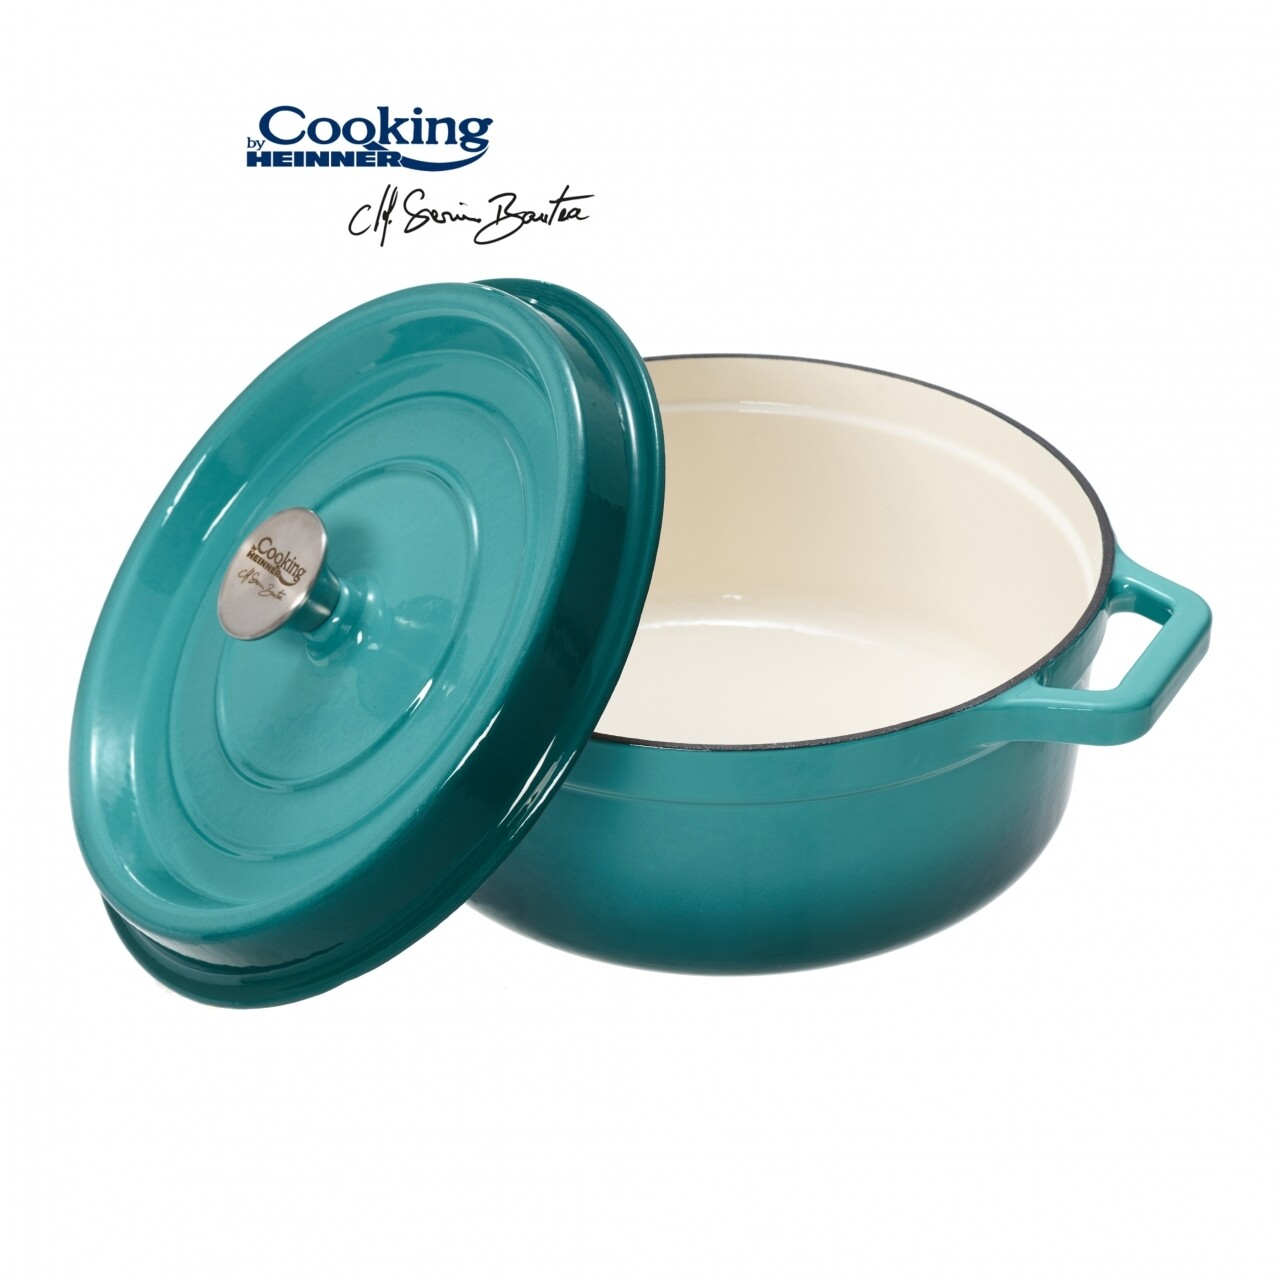 Cratita emailata, Cooking by Heinner, 6.1 l, fonta, bej si bleu